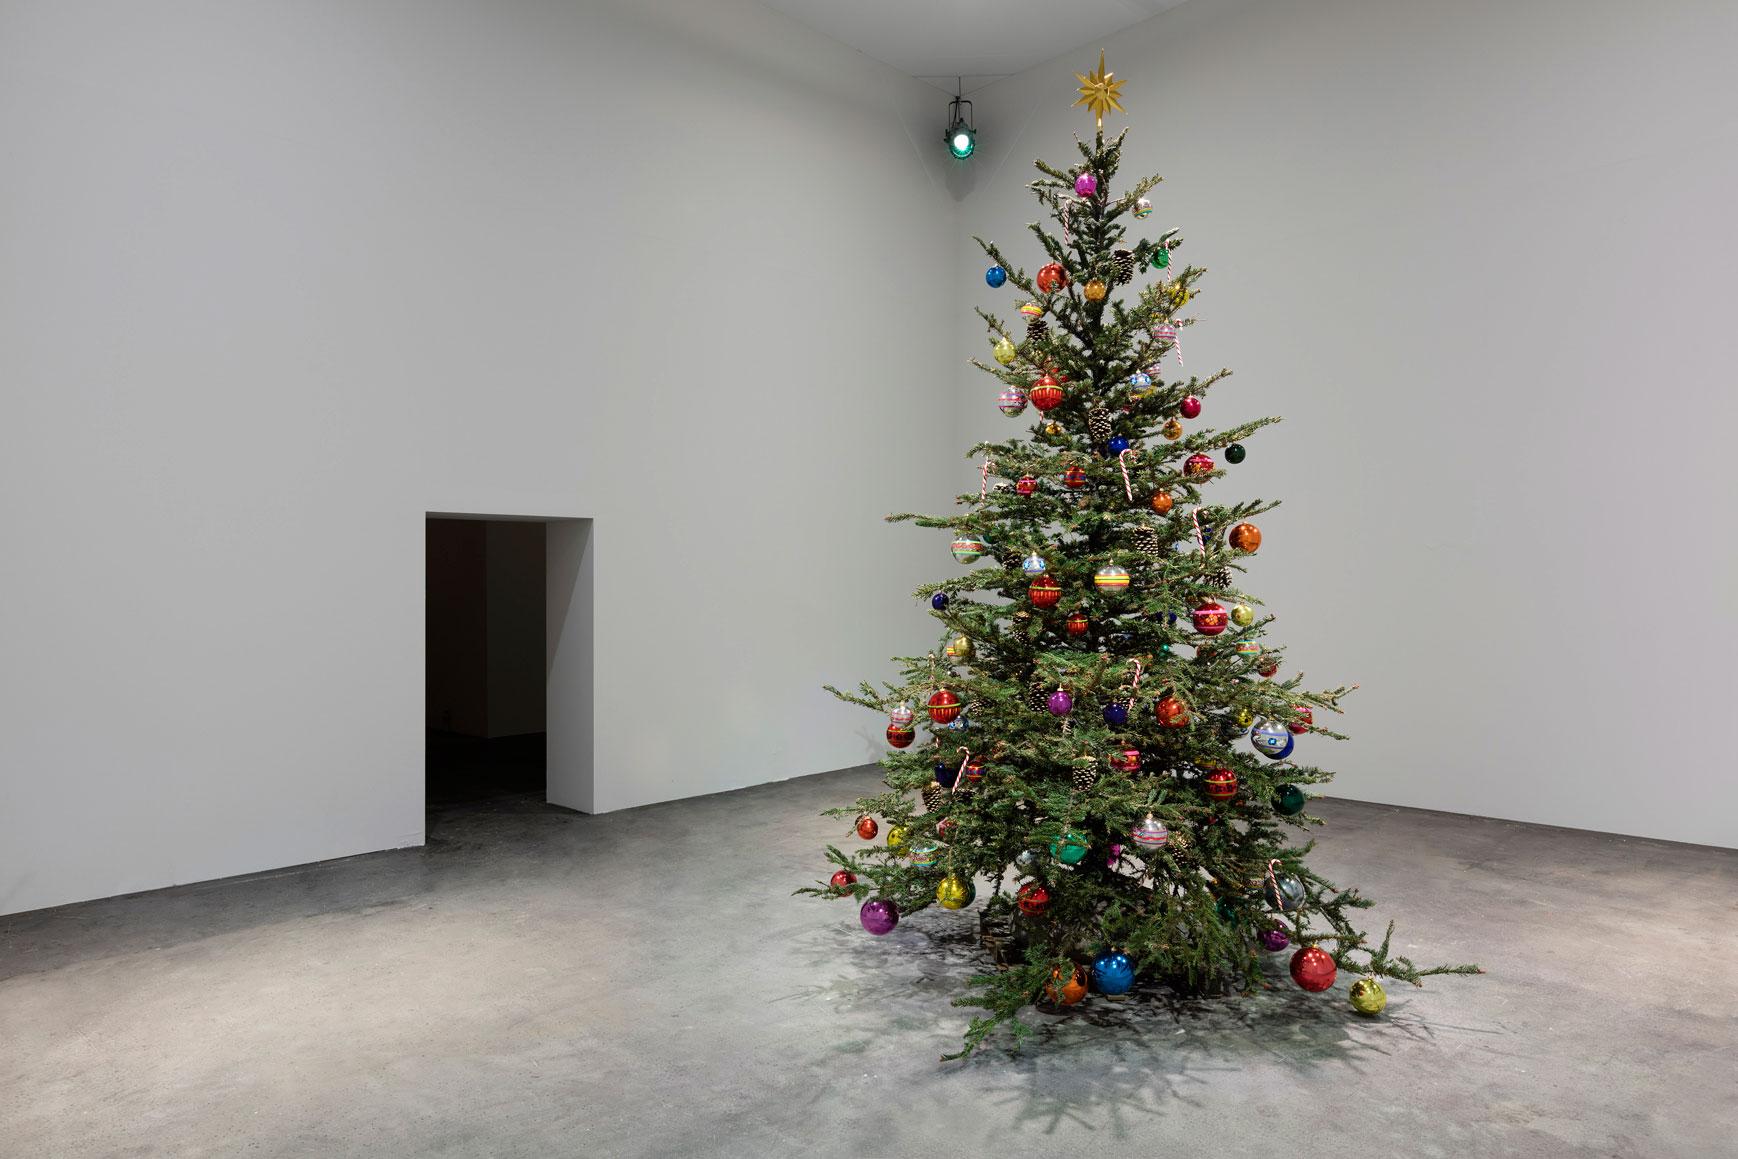 Philippe Parreno. Proyecto FRAUGHT TIMES JULY, acero inoxidable, fundido en Alfa arte. Exposición en Art Basel, Suiza